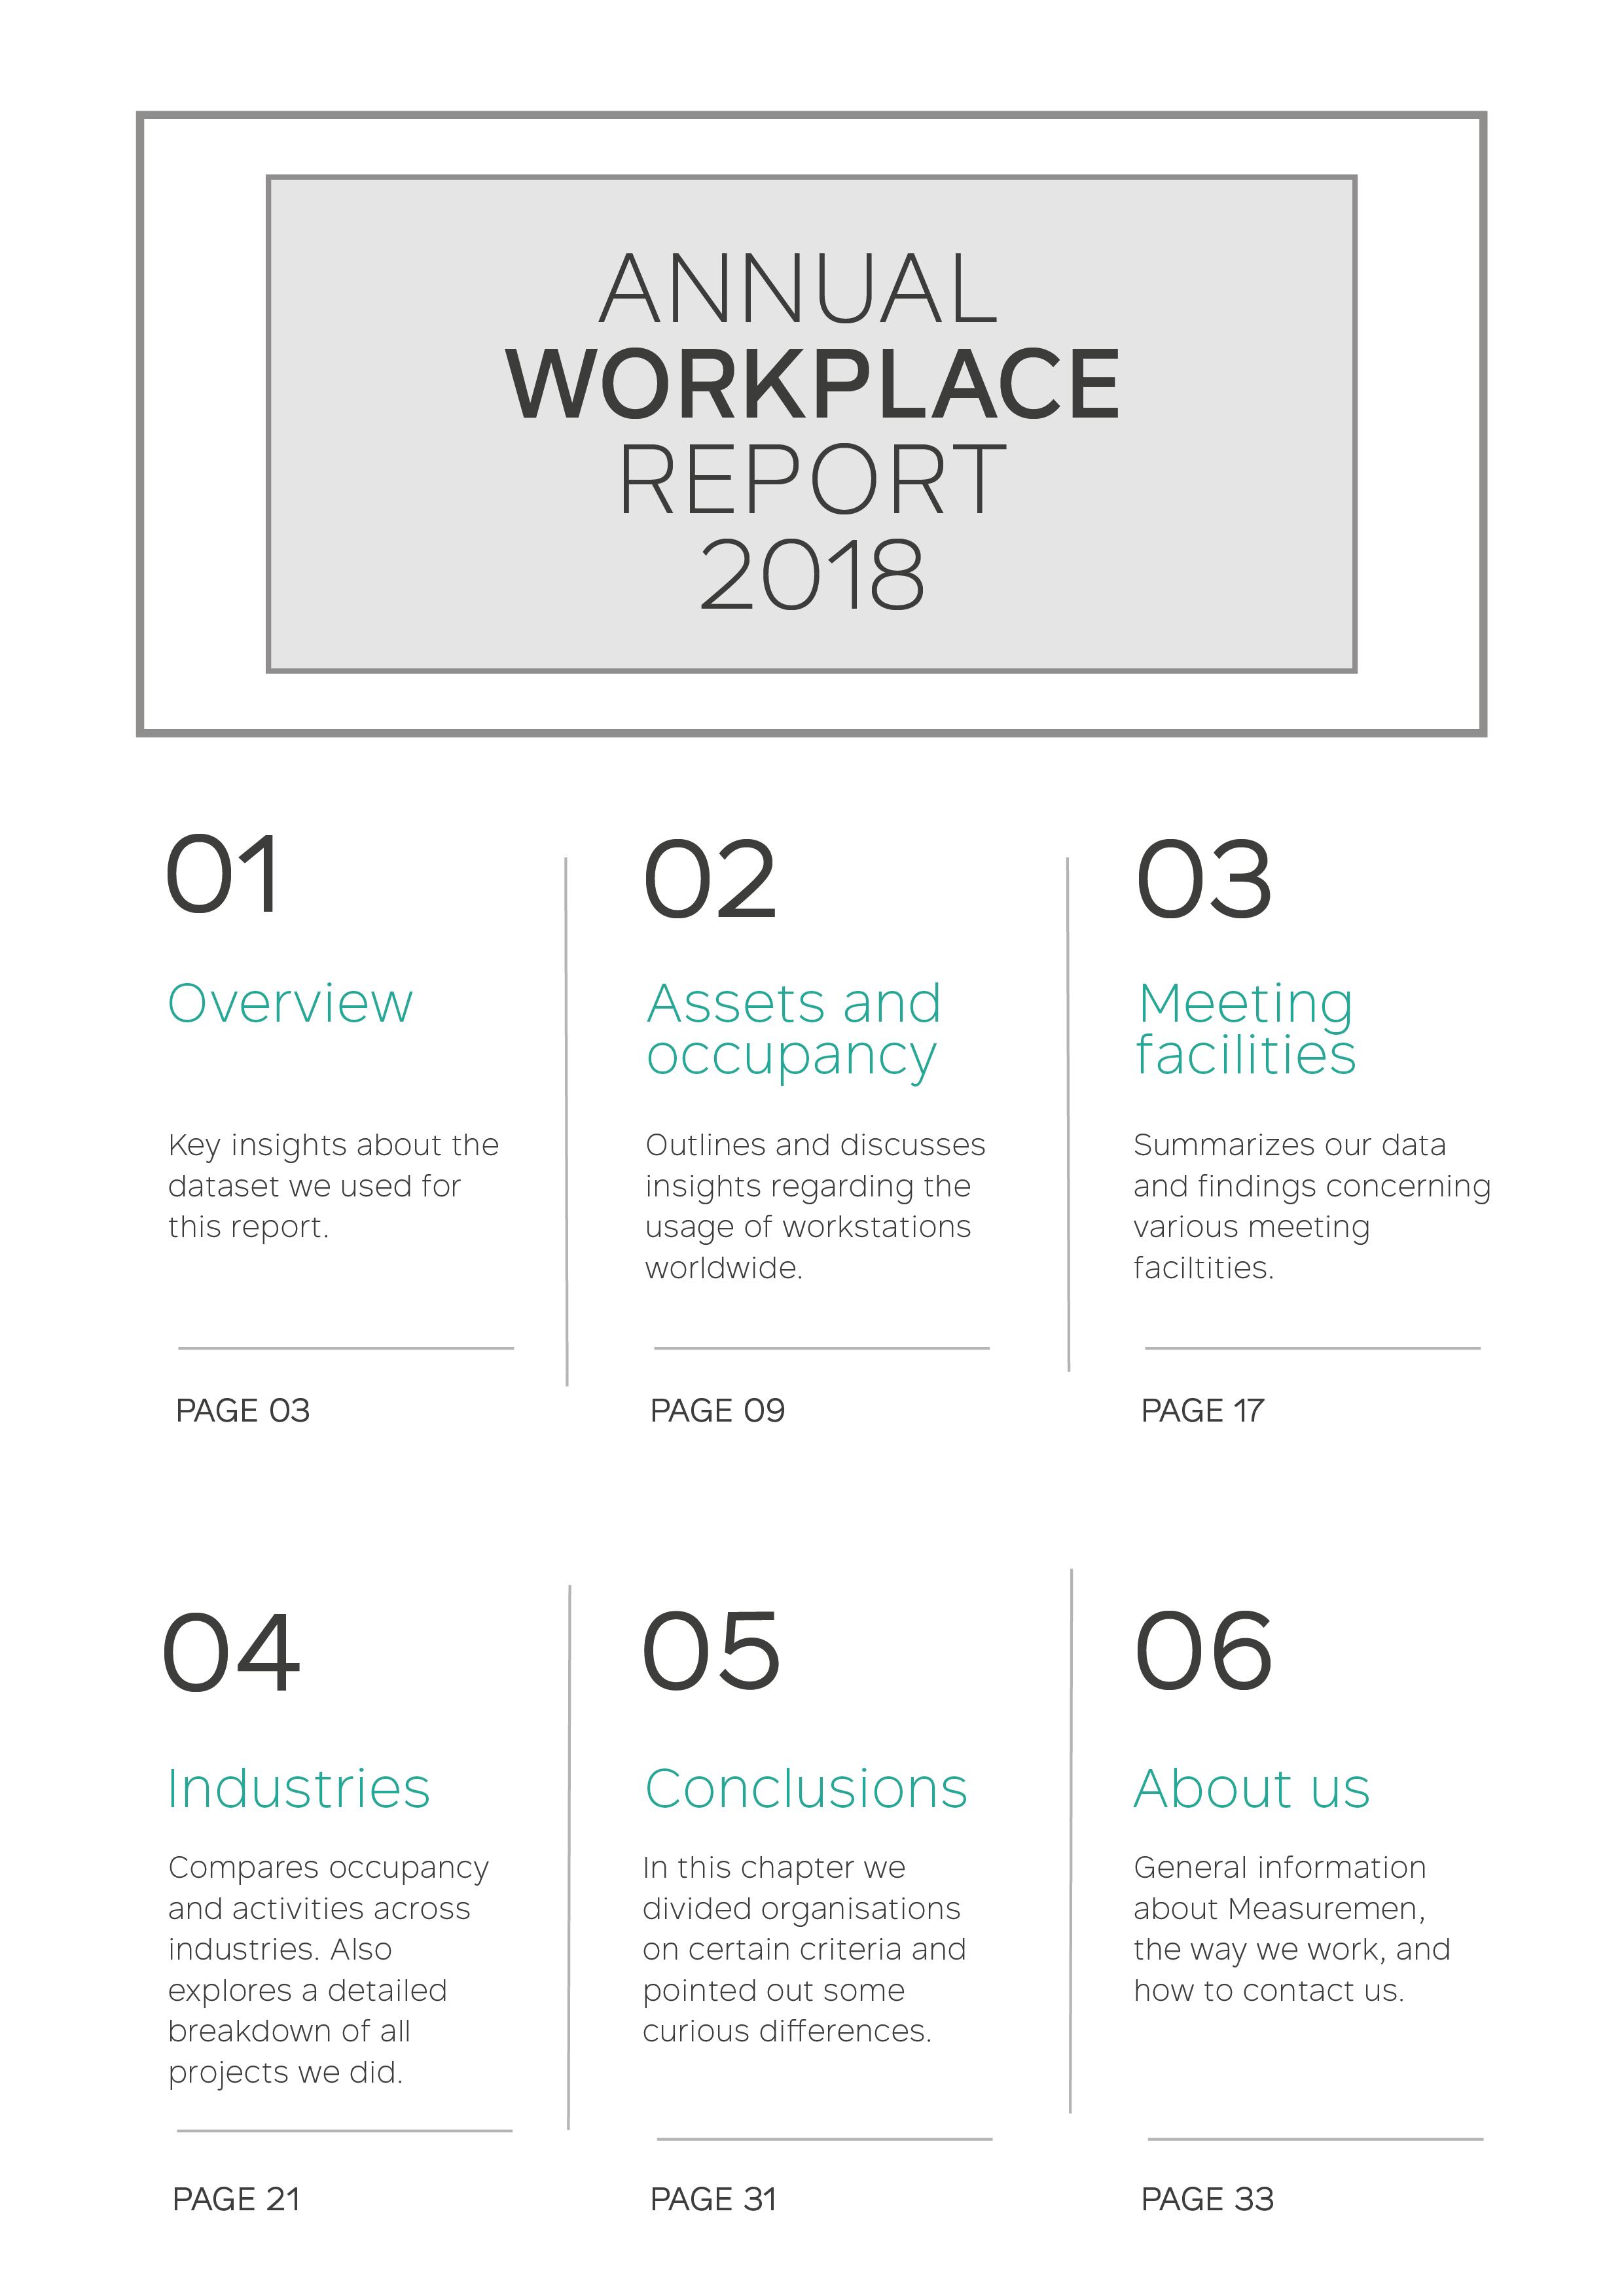 Measuremen  Annual Workplace Report 2018